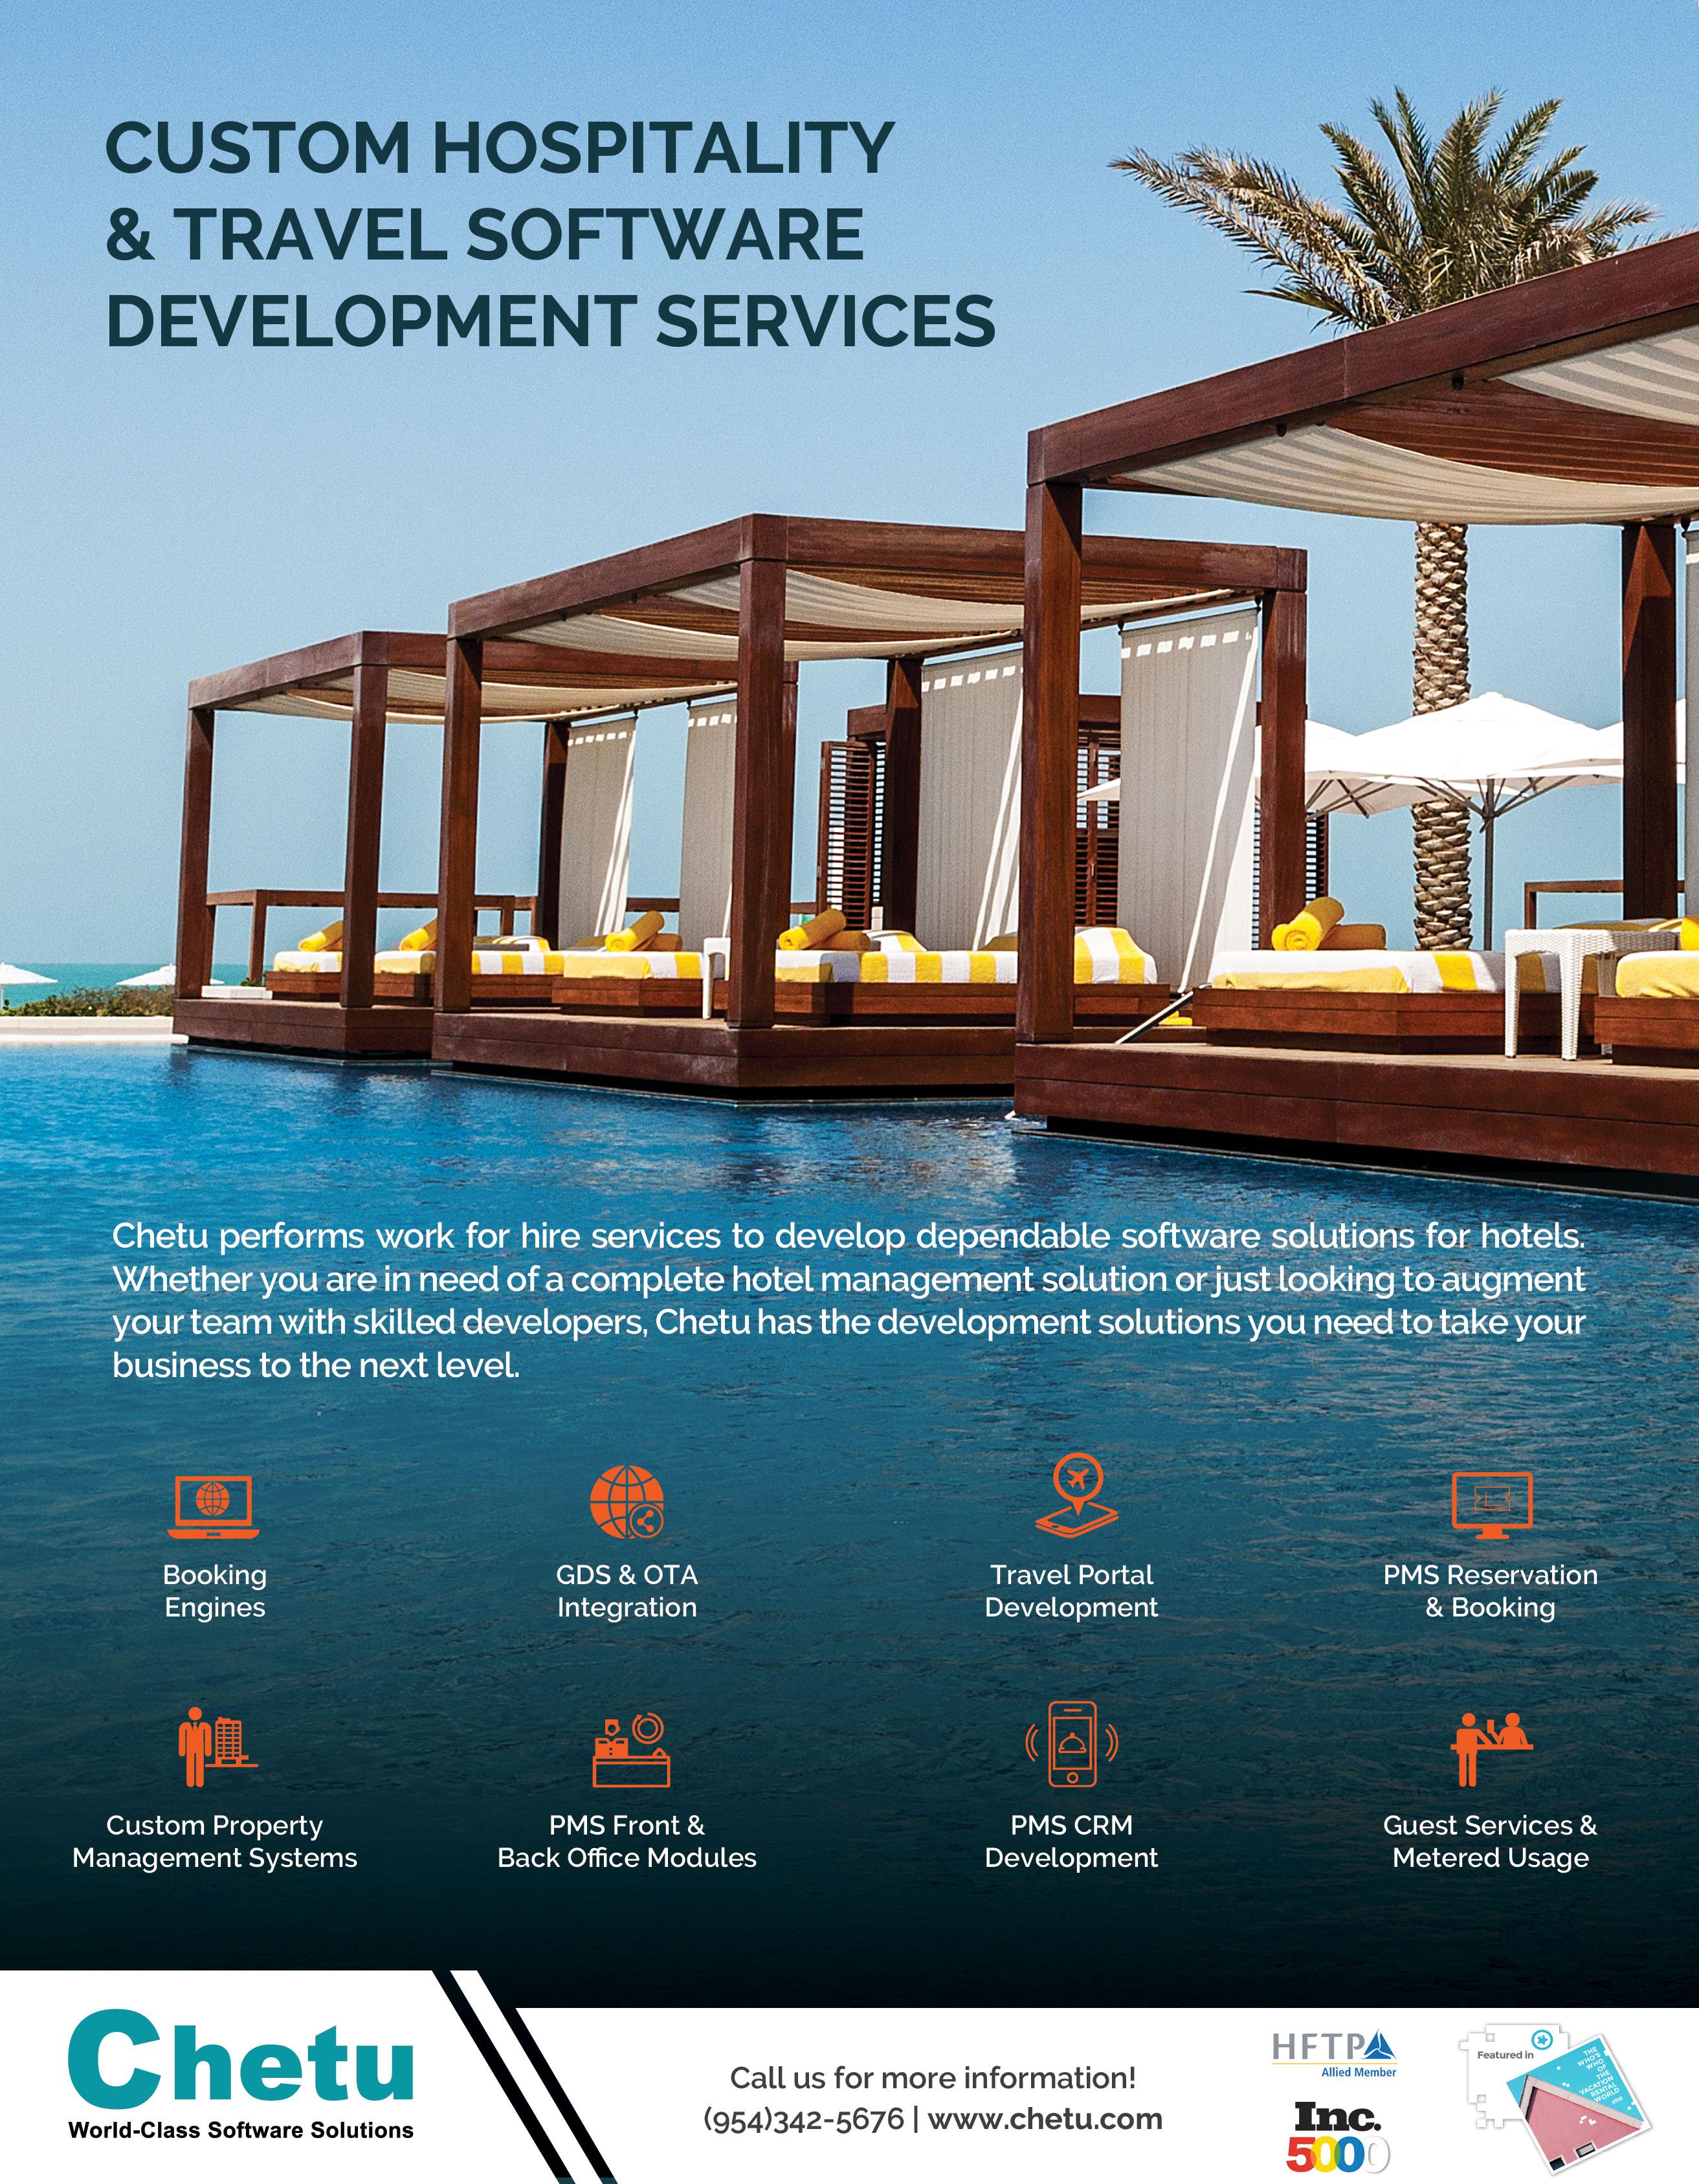 Chetu Demo - Chetu's Hospitality and Travel Software Solutions.jpg